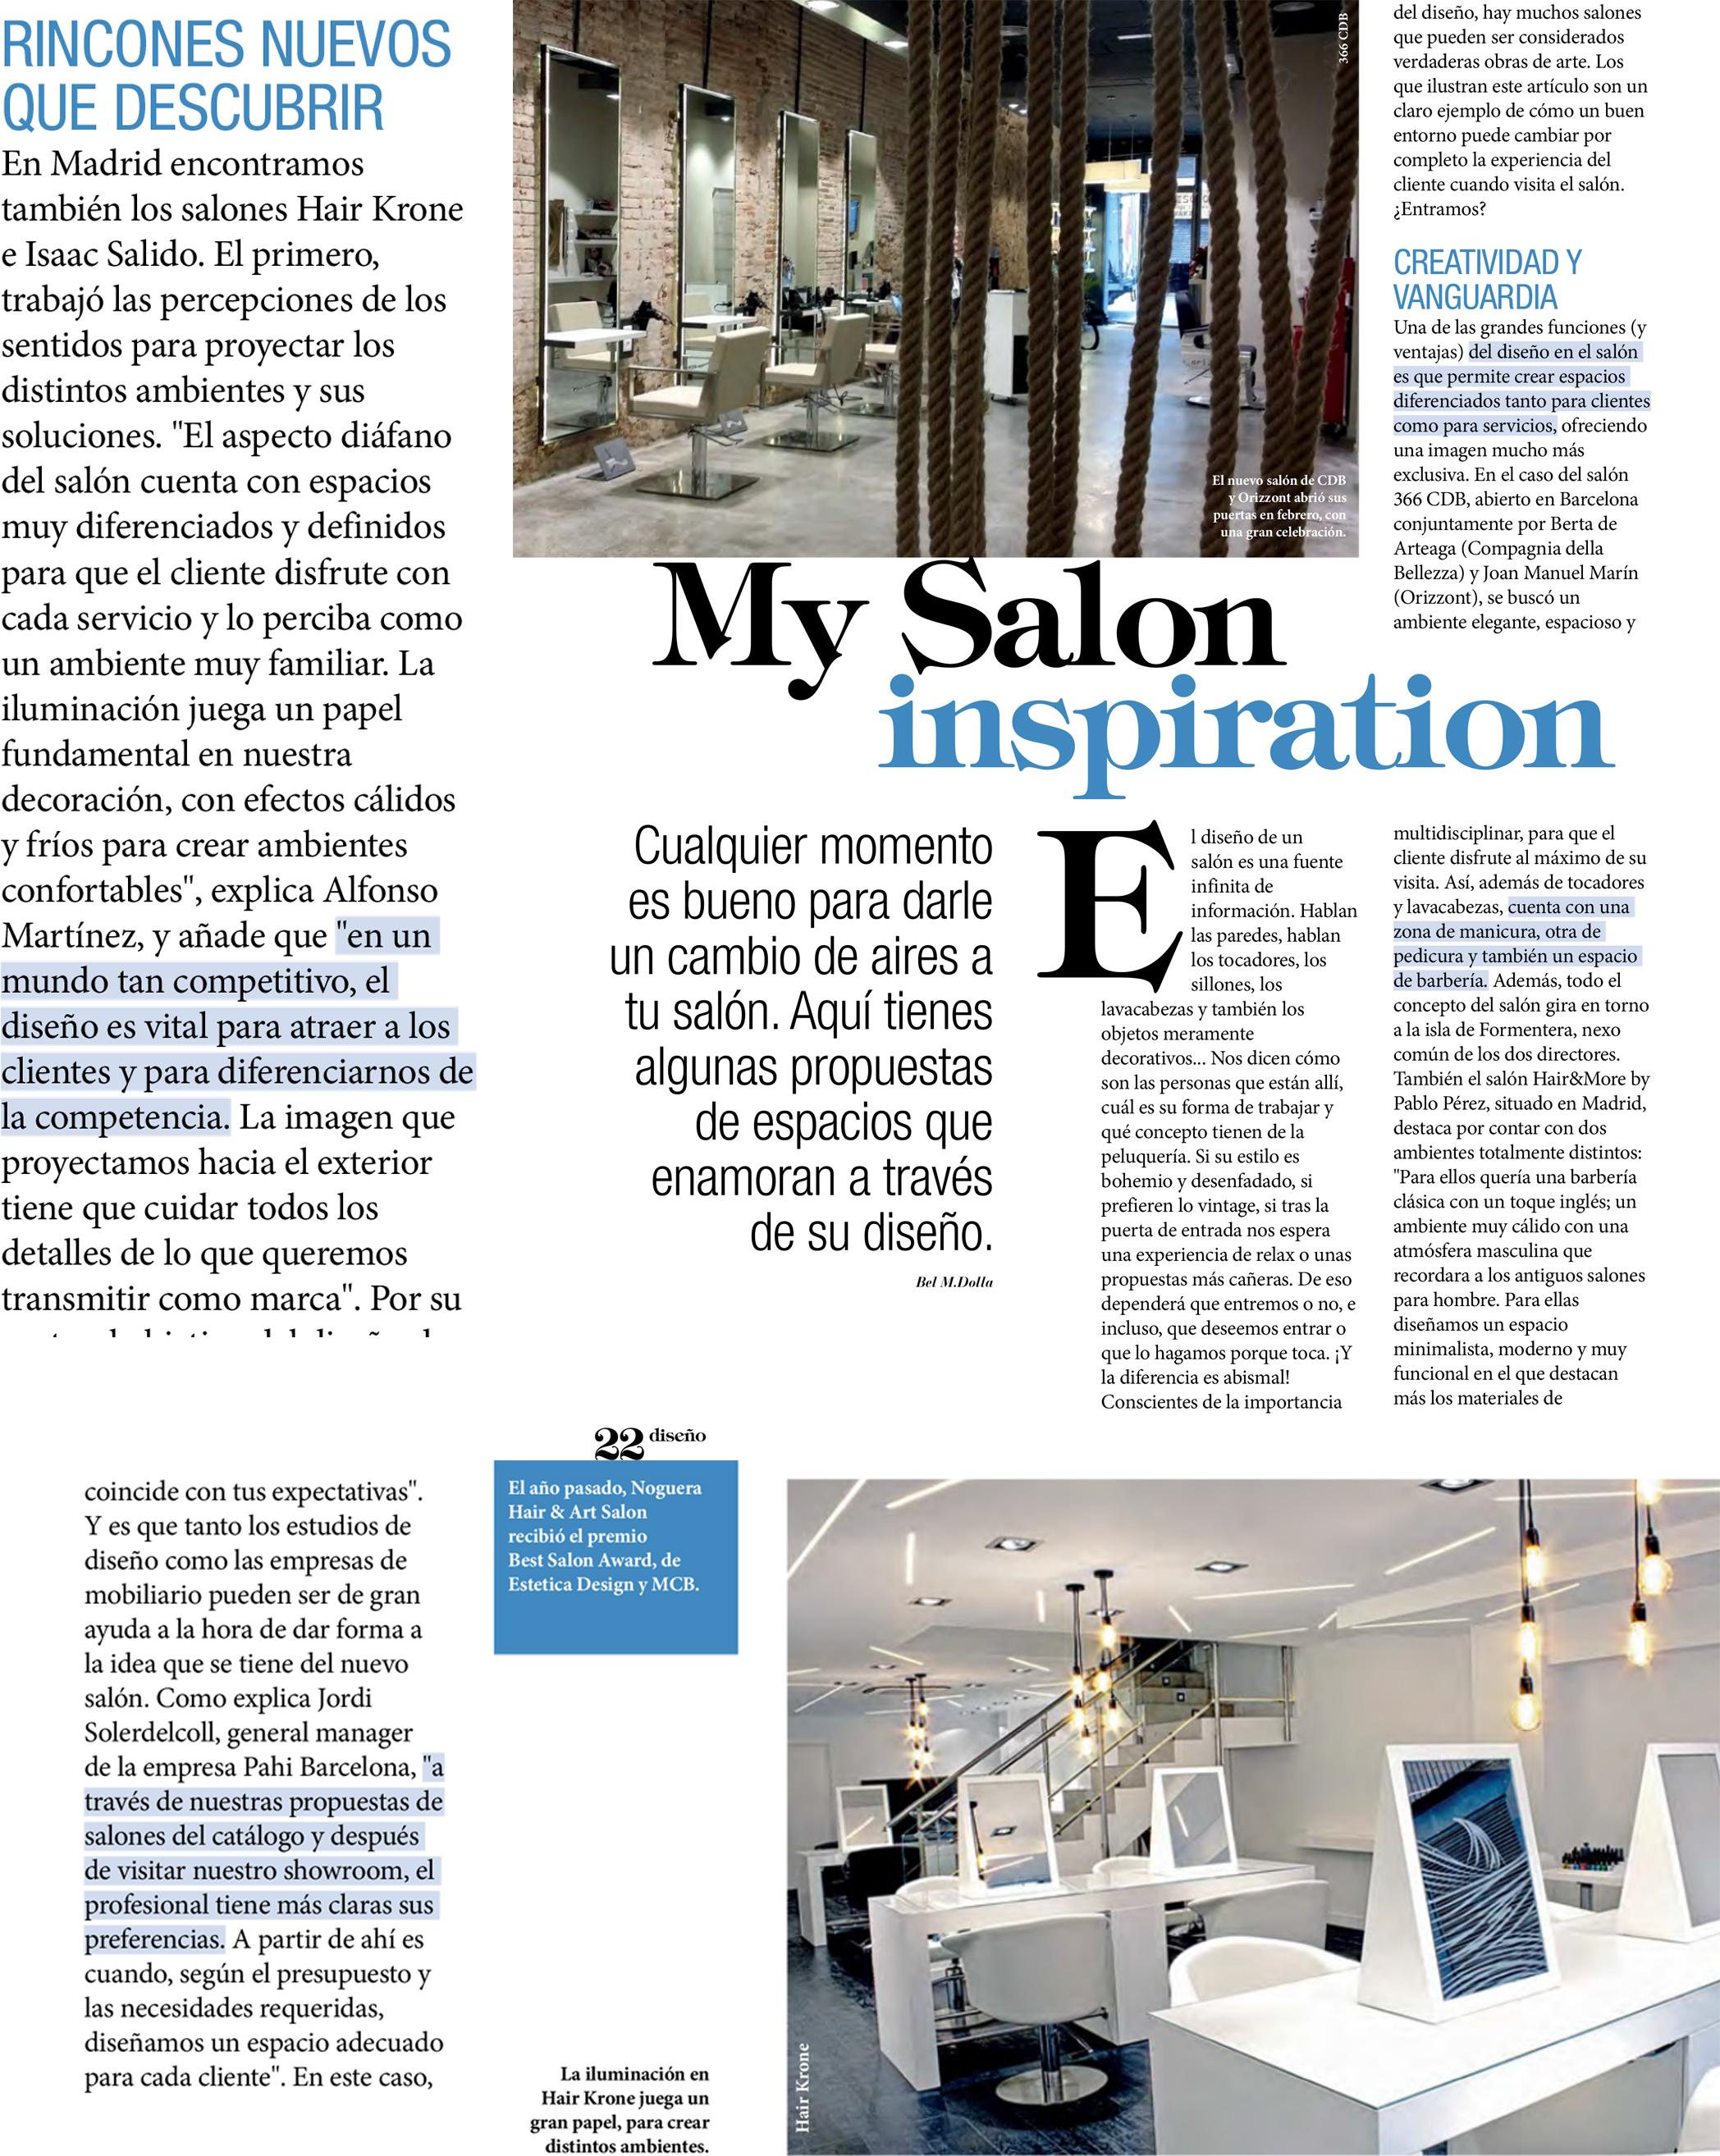 Hairkrone salones de inspiraci n hairkrone - Inspiracion salones ...